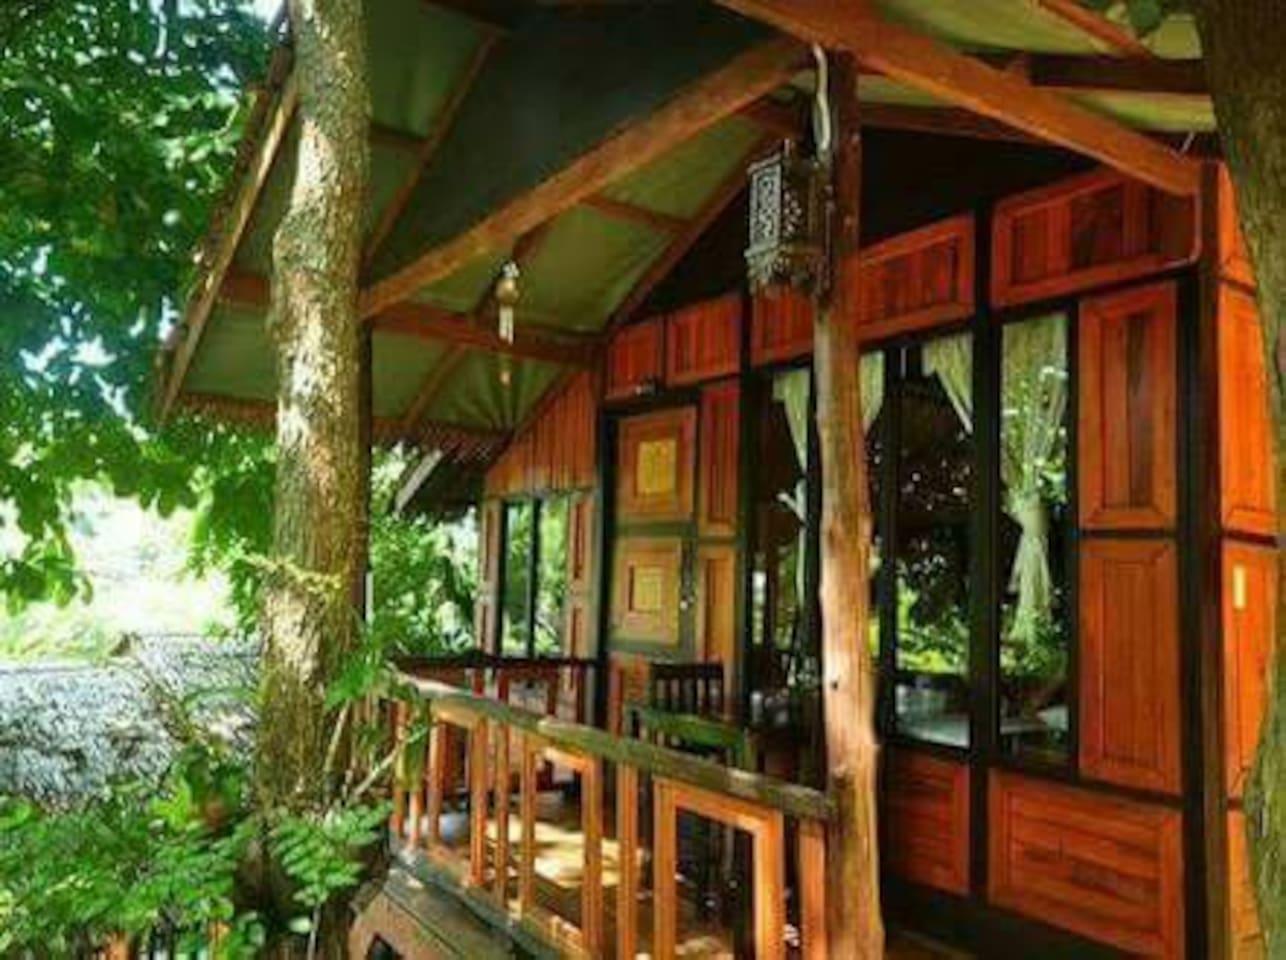 Deluxe bungalow สตูดิโอ บังกะโล 1 ห้องน้ำส่วนตัว ขนาด 25 ตร.ม. – อ่าวโละดาลัม